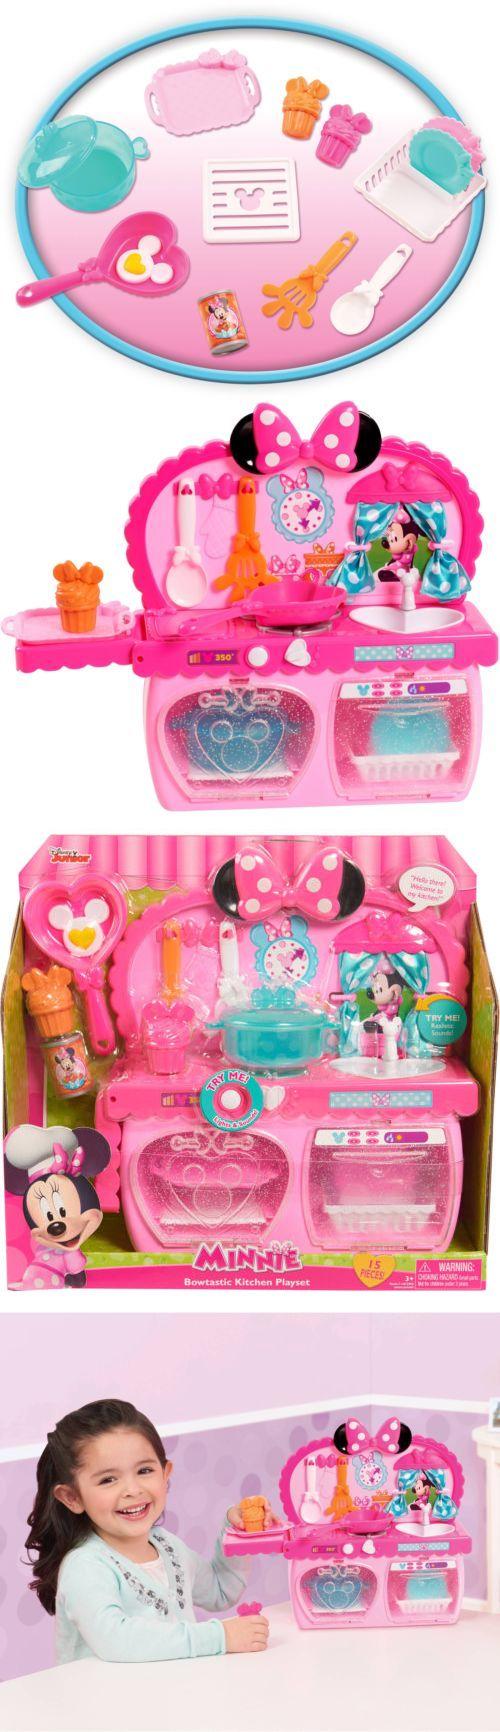 Minnie 19220: Disney Minnie Bow-Tique Bowtastic Kitchen Playset -> BUY IT NOW ONLY: $33.71 on eBay!